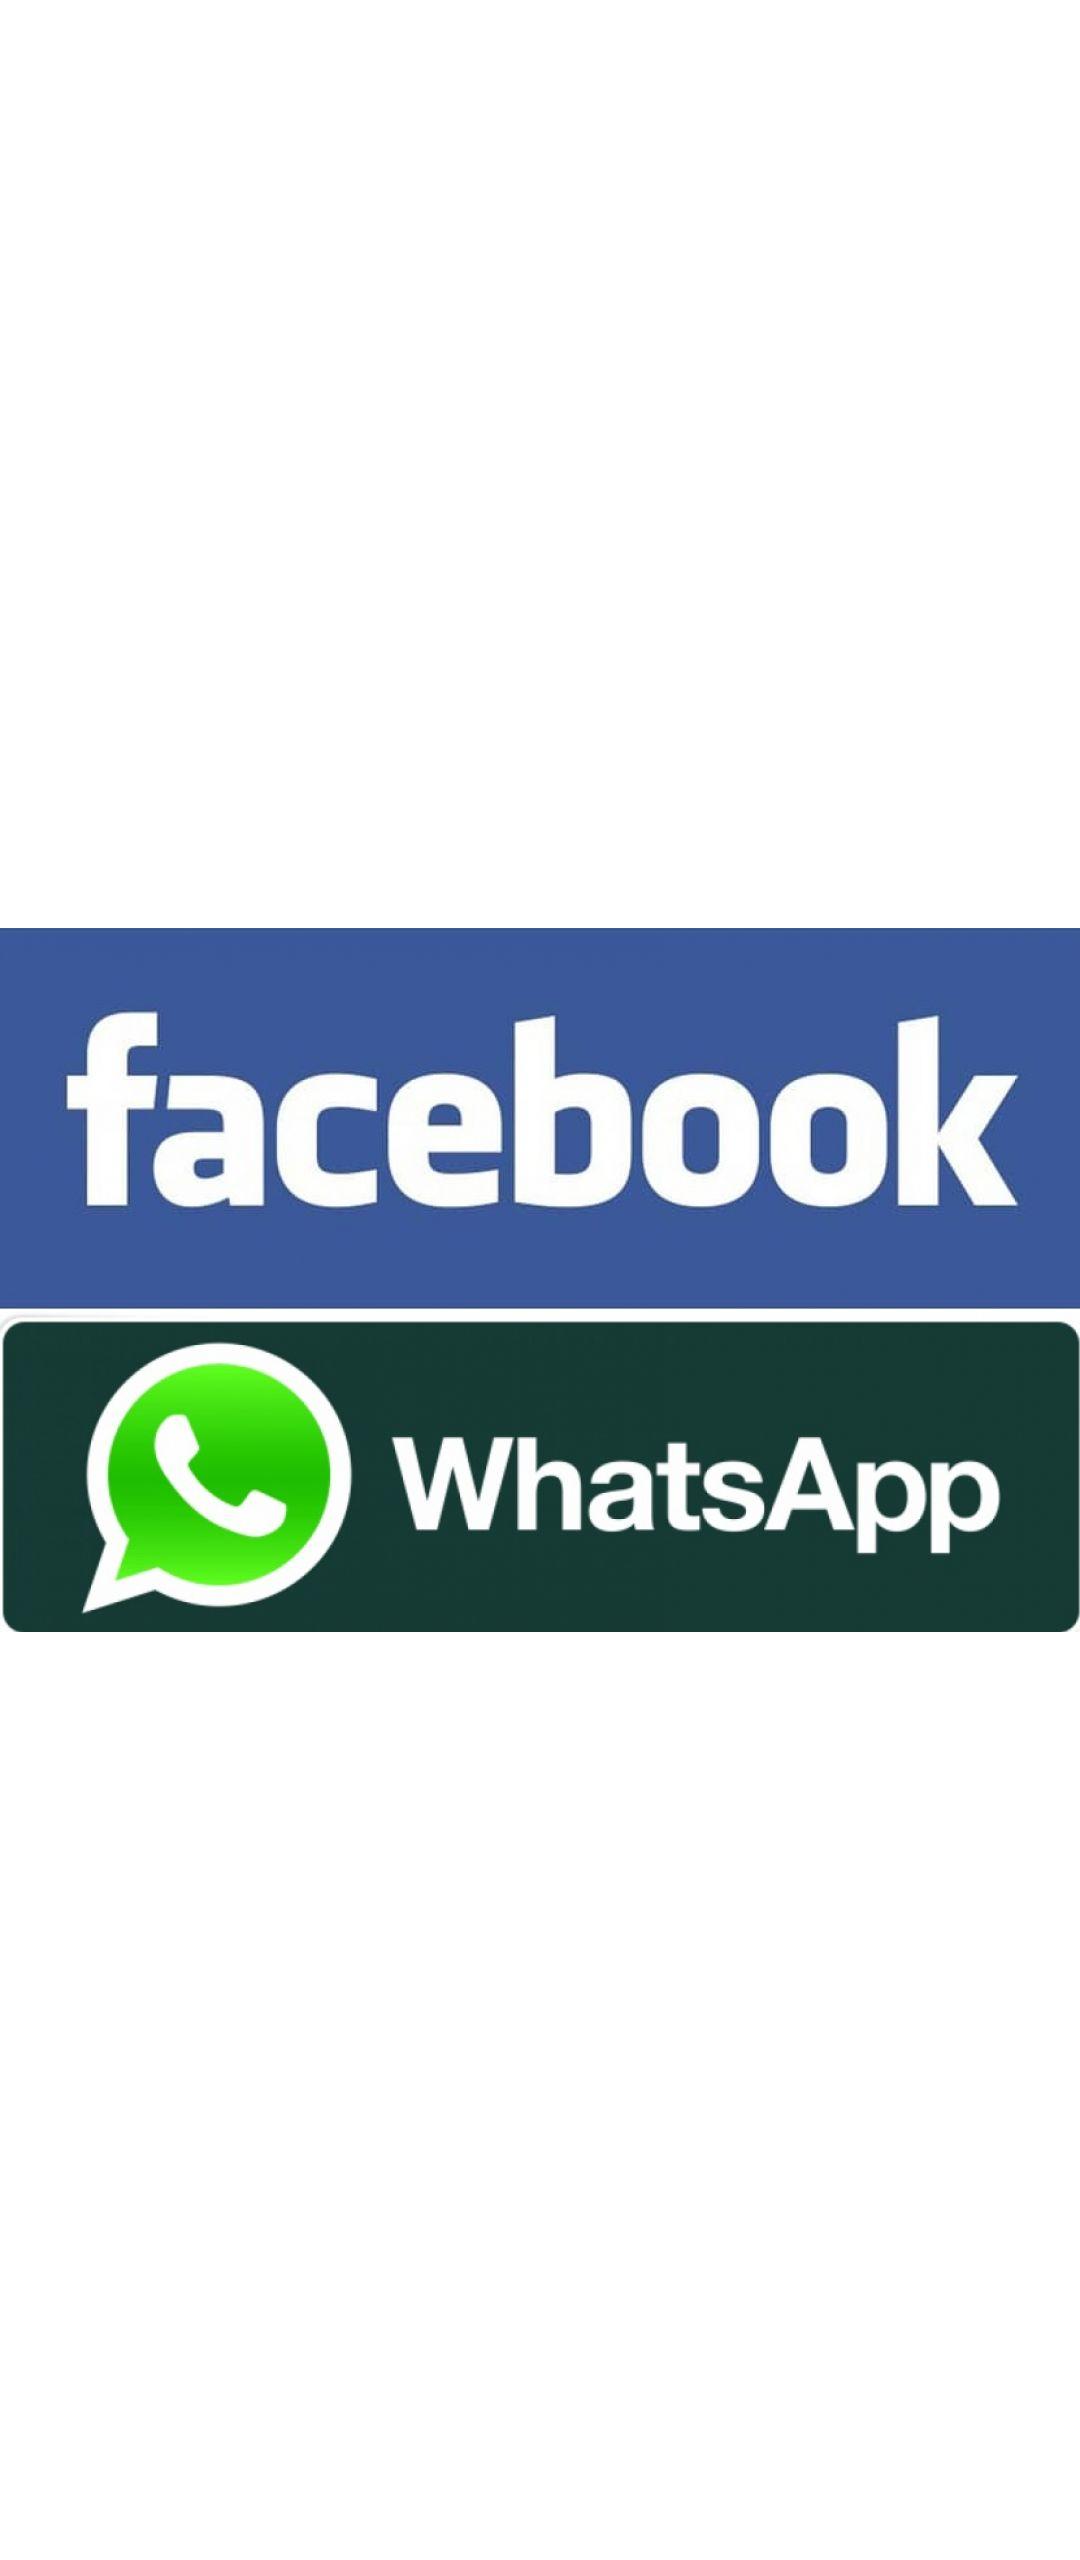 WhatsApp comenzar� a compartir datos de sus usuarios con Facebook